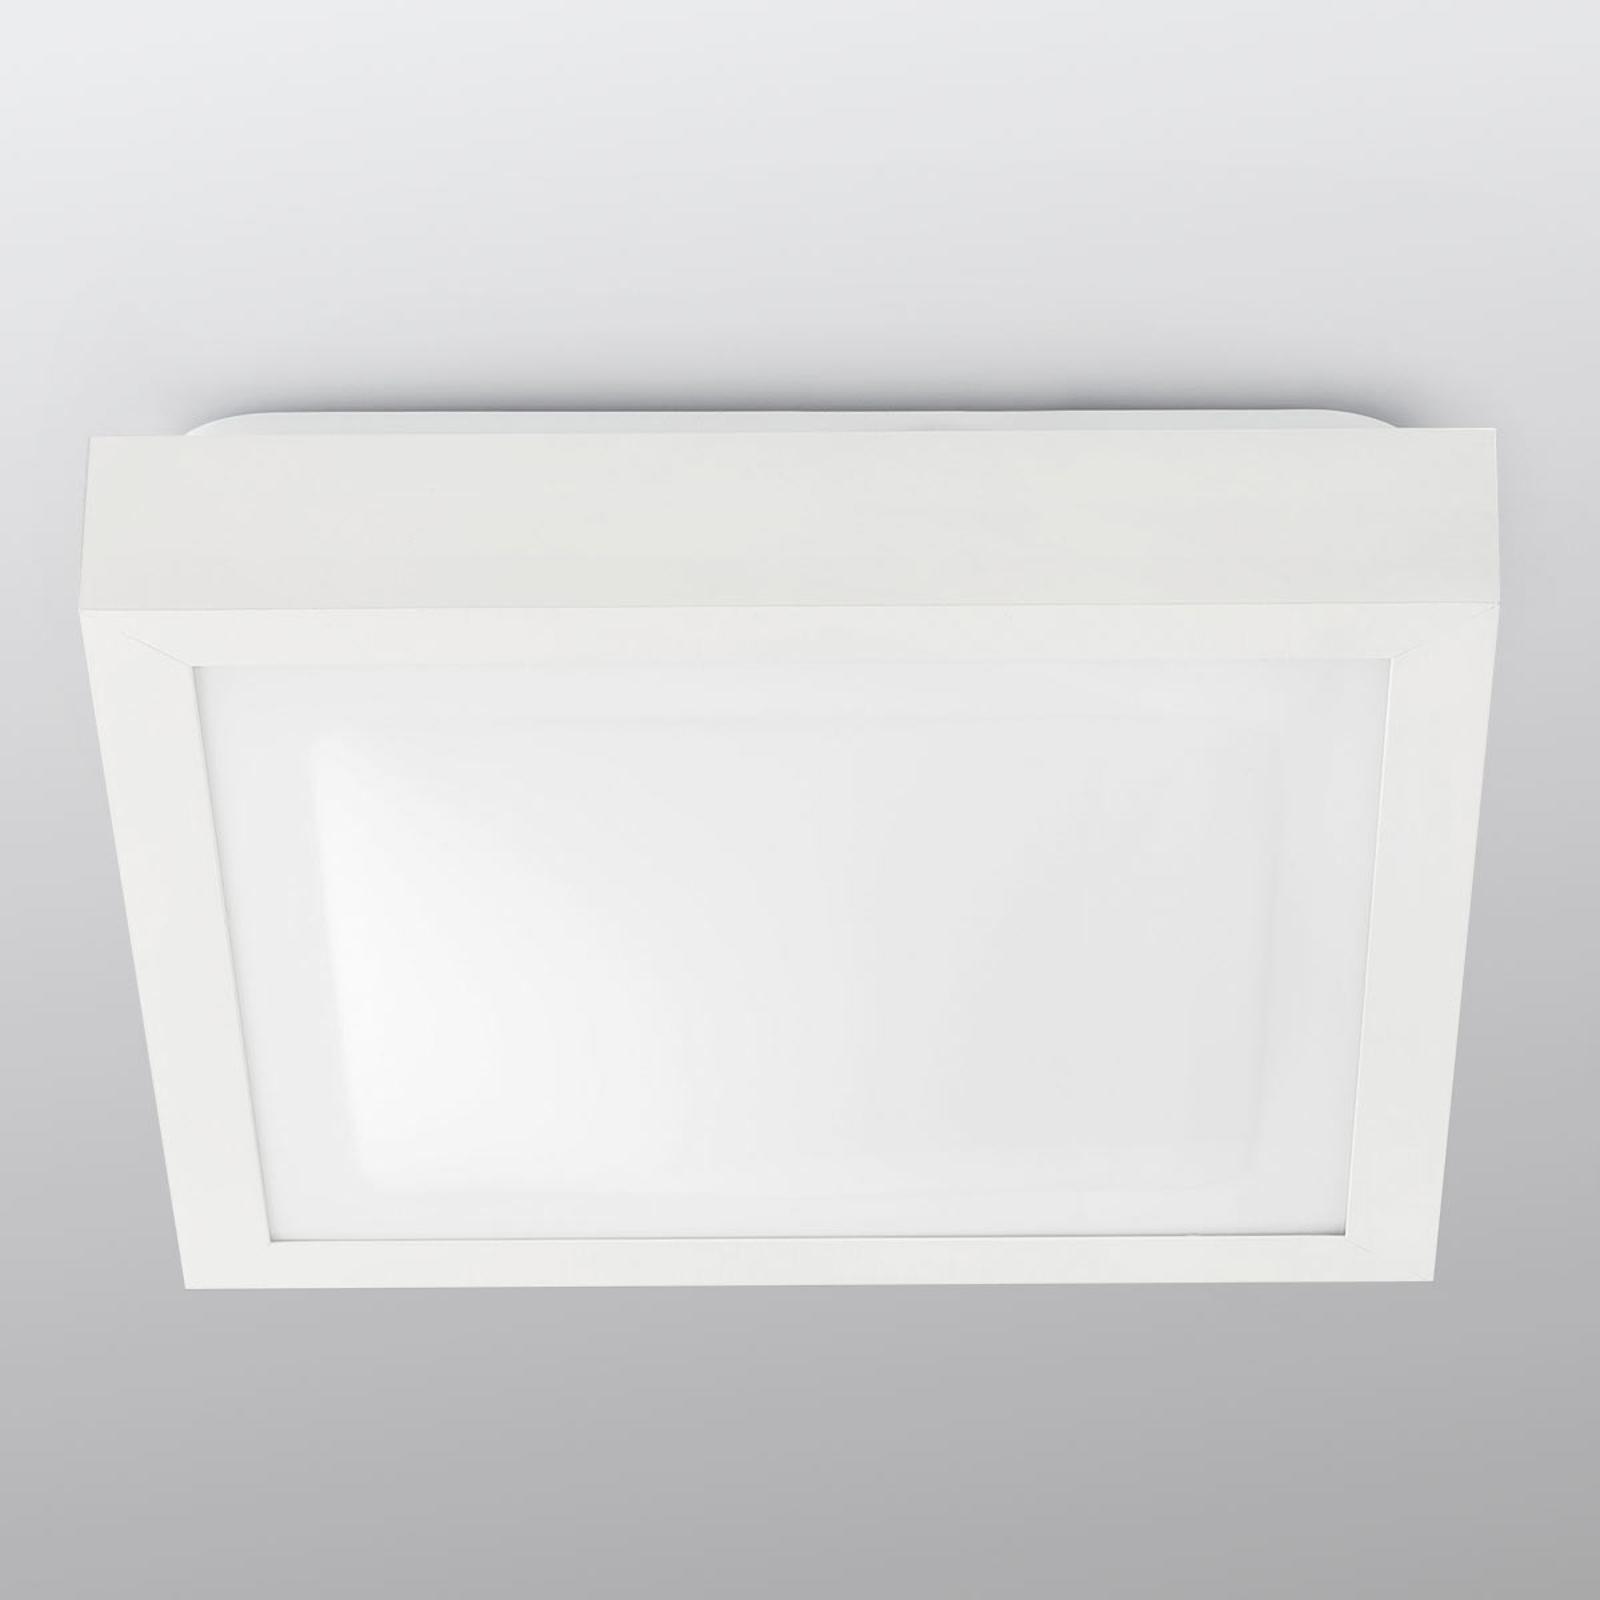 Badkamer plafondlamp Tola in hoekige vorm